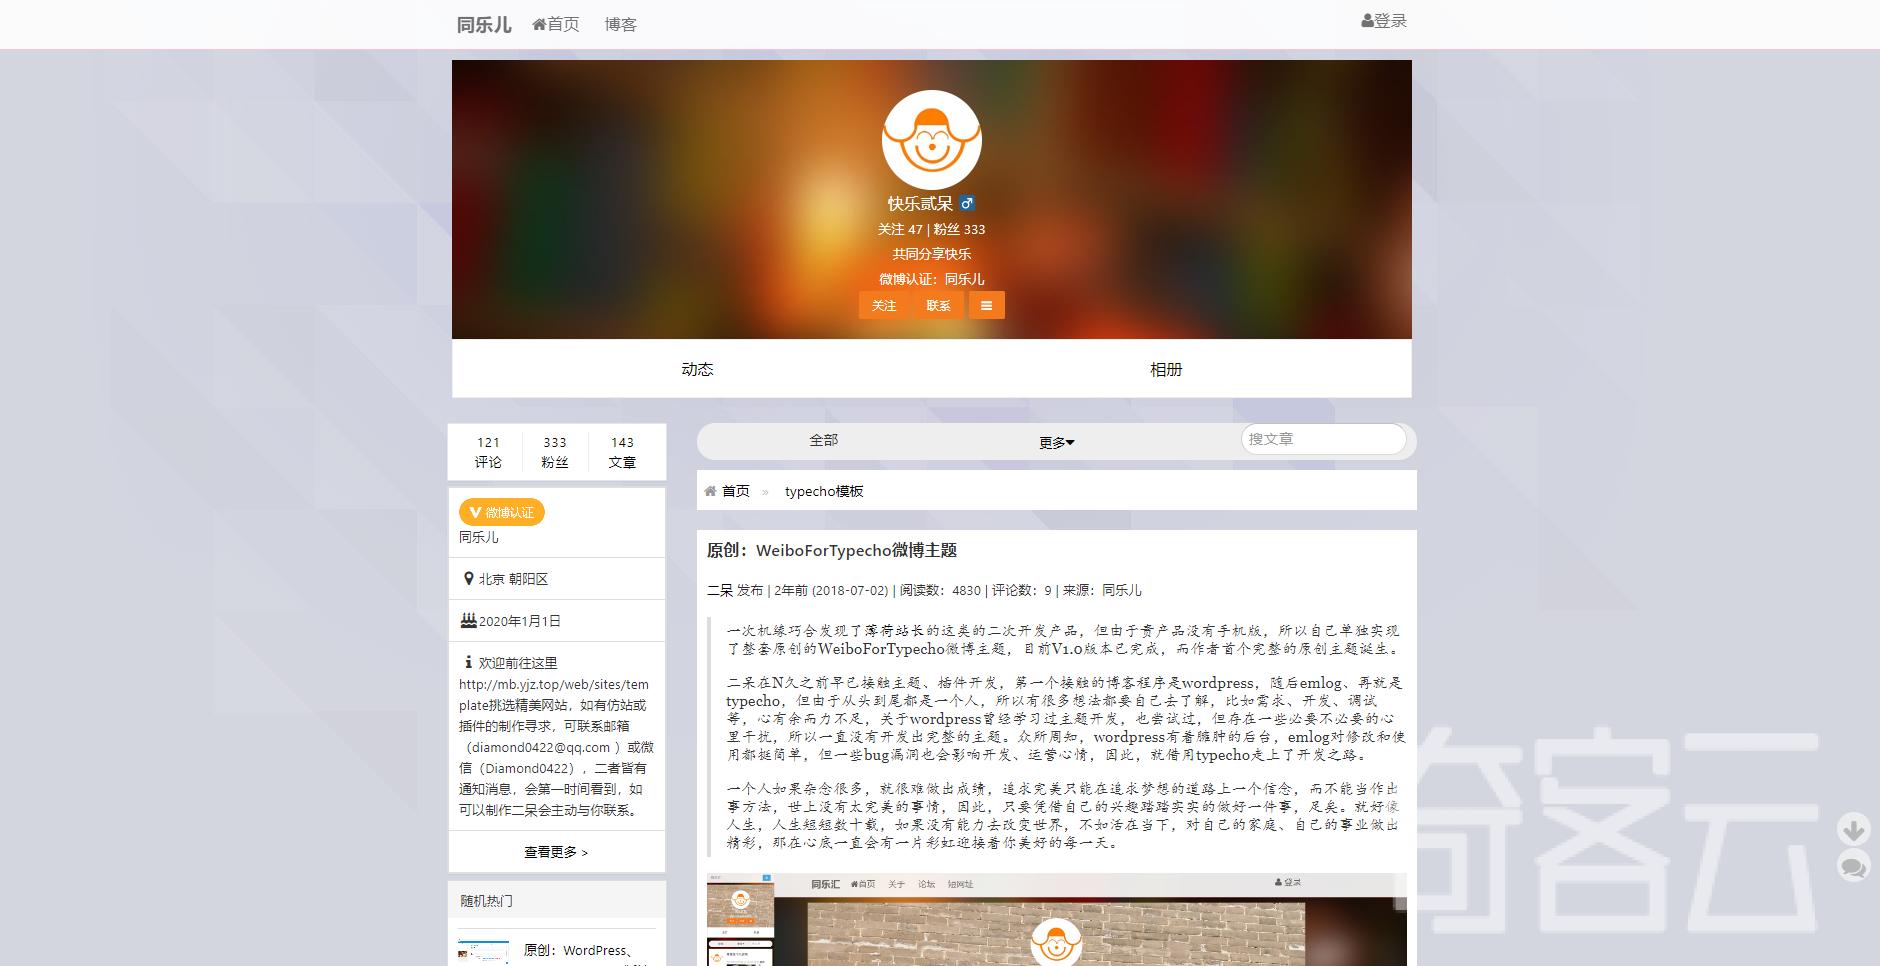 WordPress|Typecho| emlog 仿微博社交模板Tongleer主题免费下载-奇客云